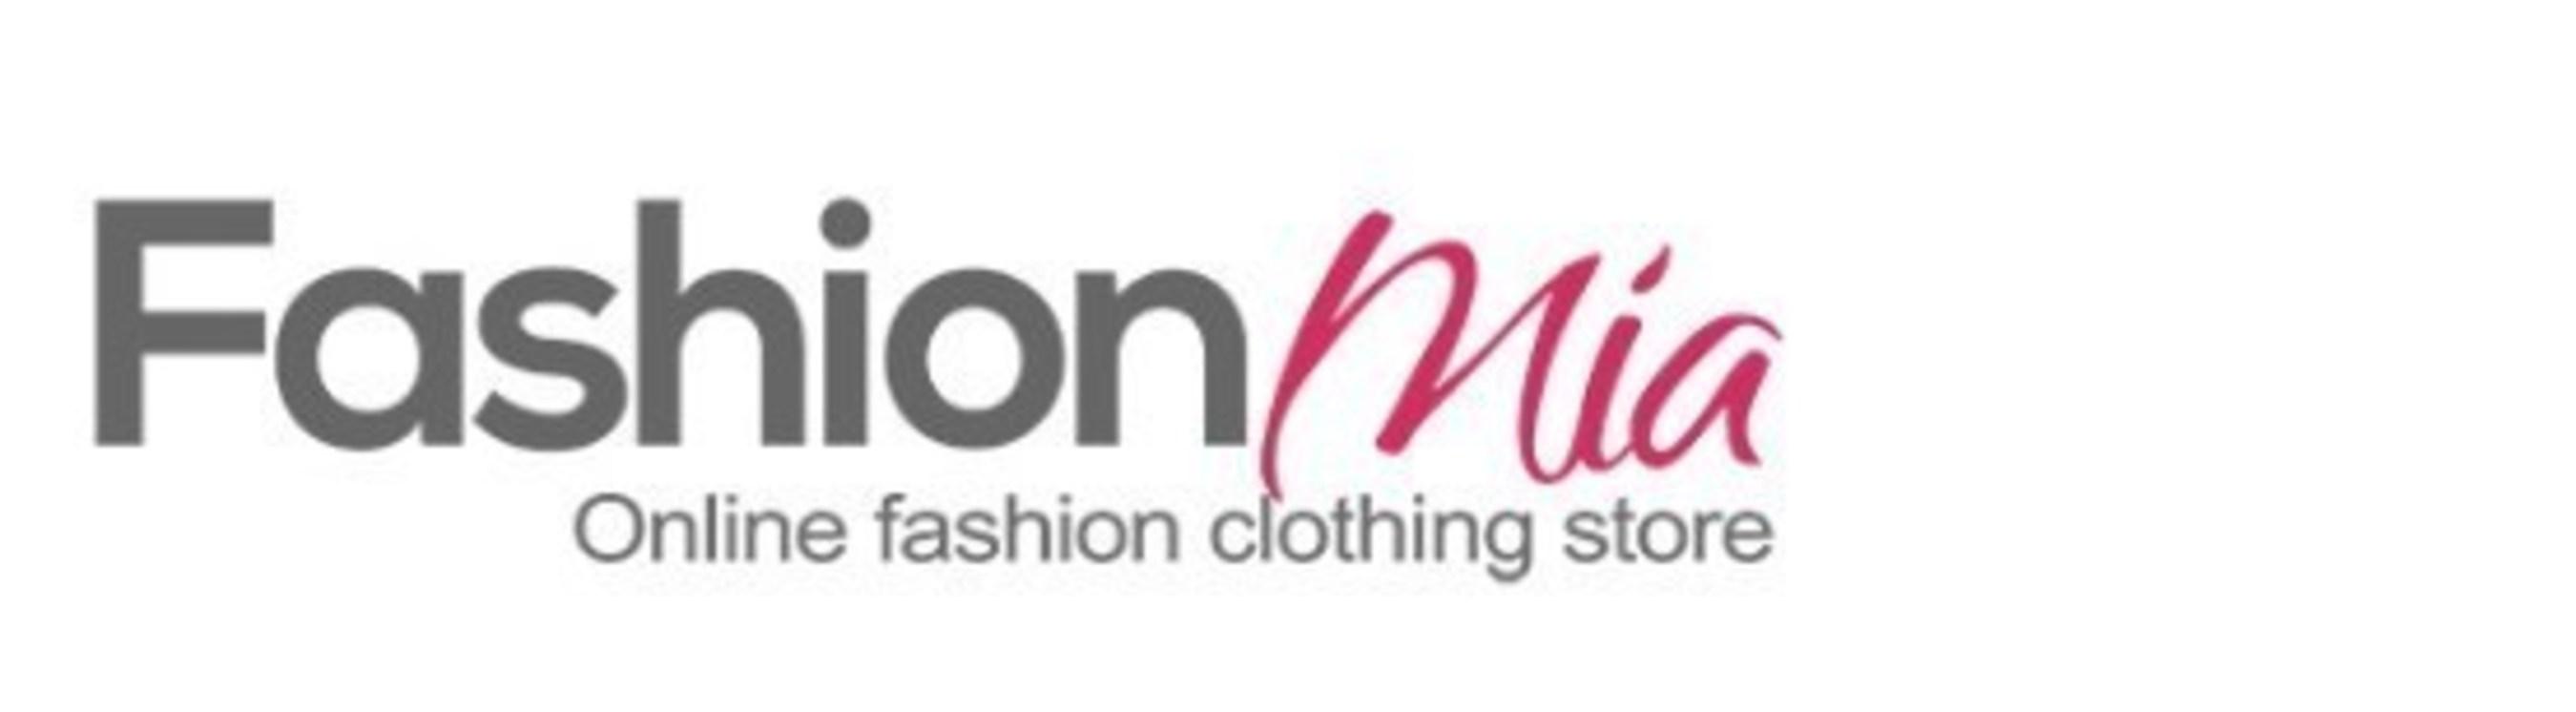 FashionMia Logo (PRNewsFoto/FashionMia)